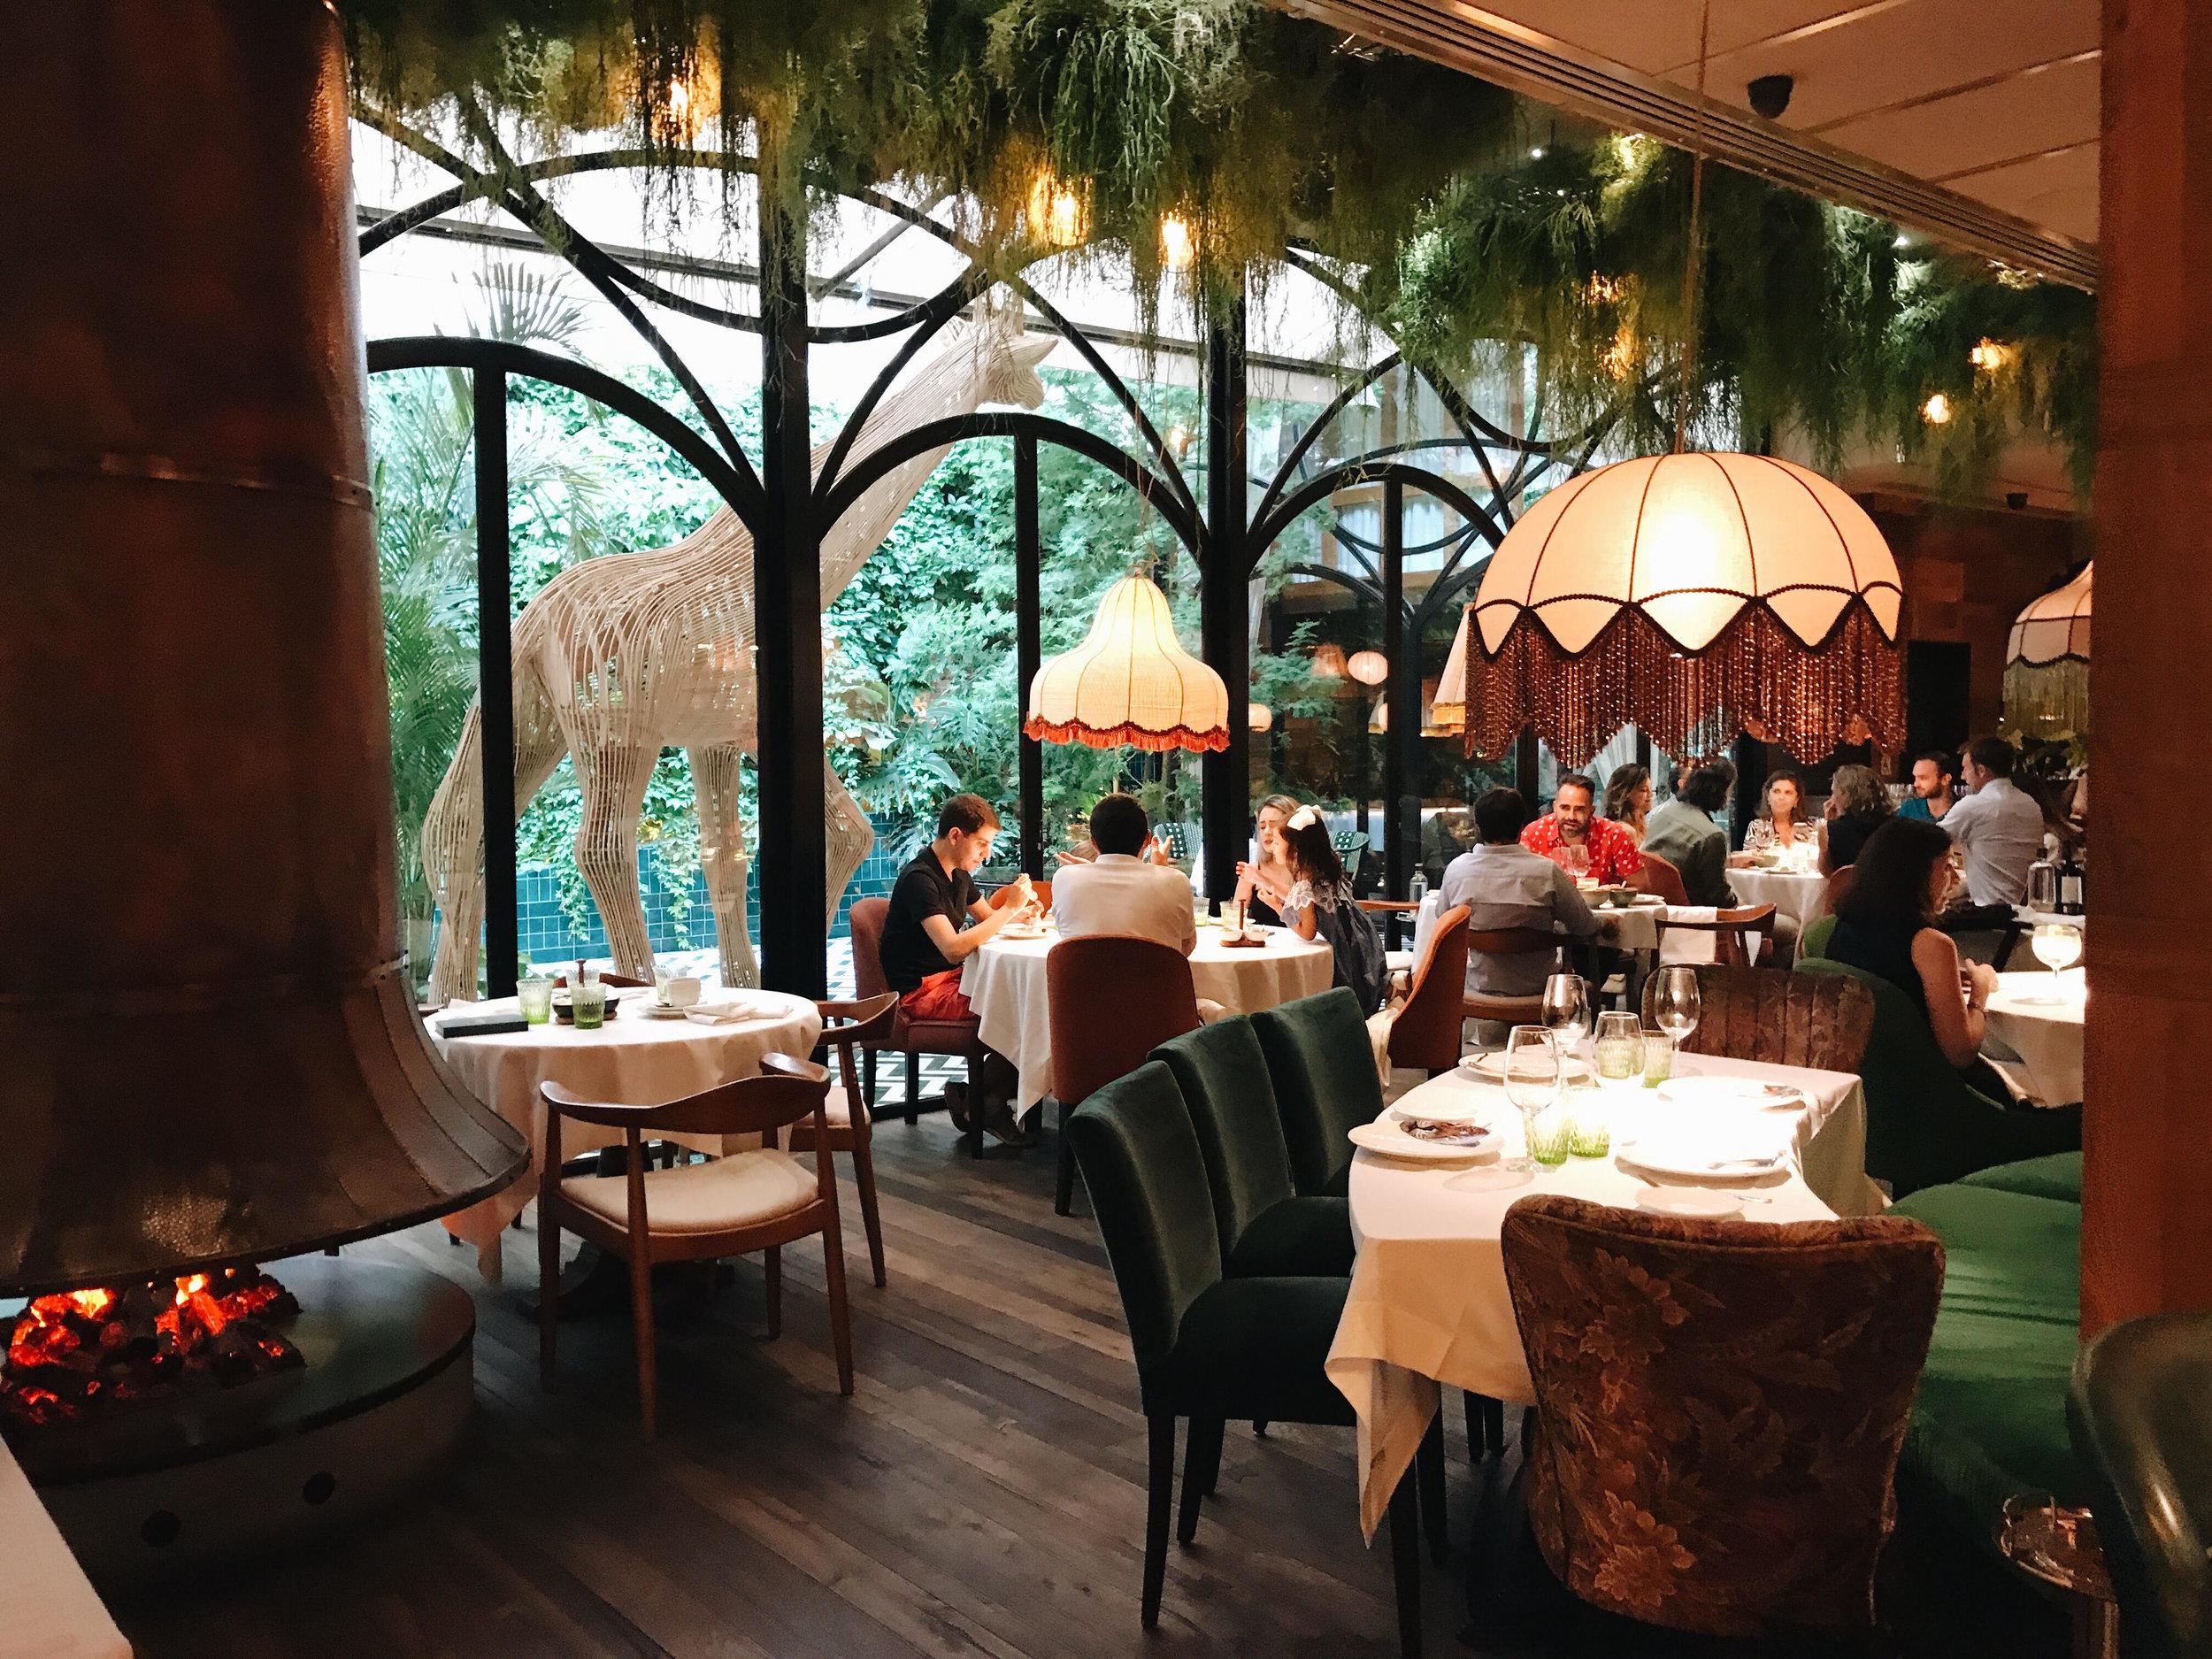 restaurante amazonico opinion